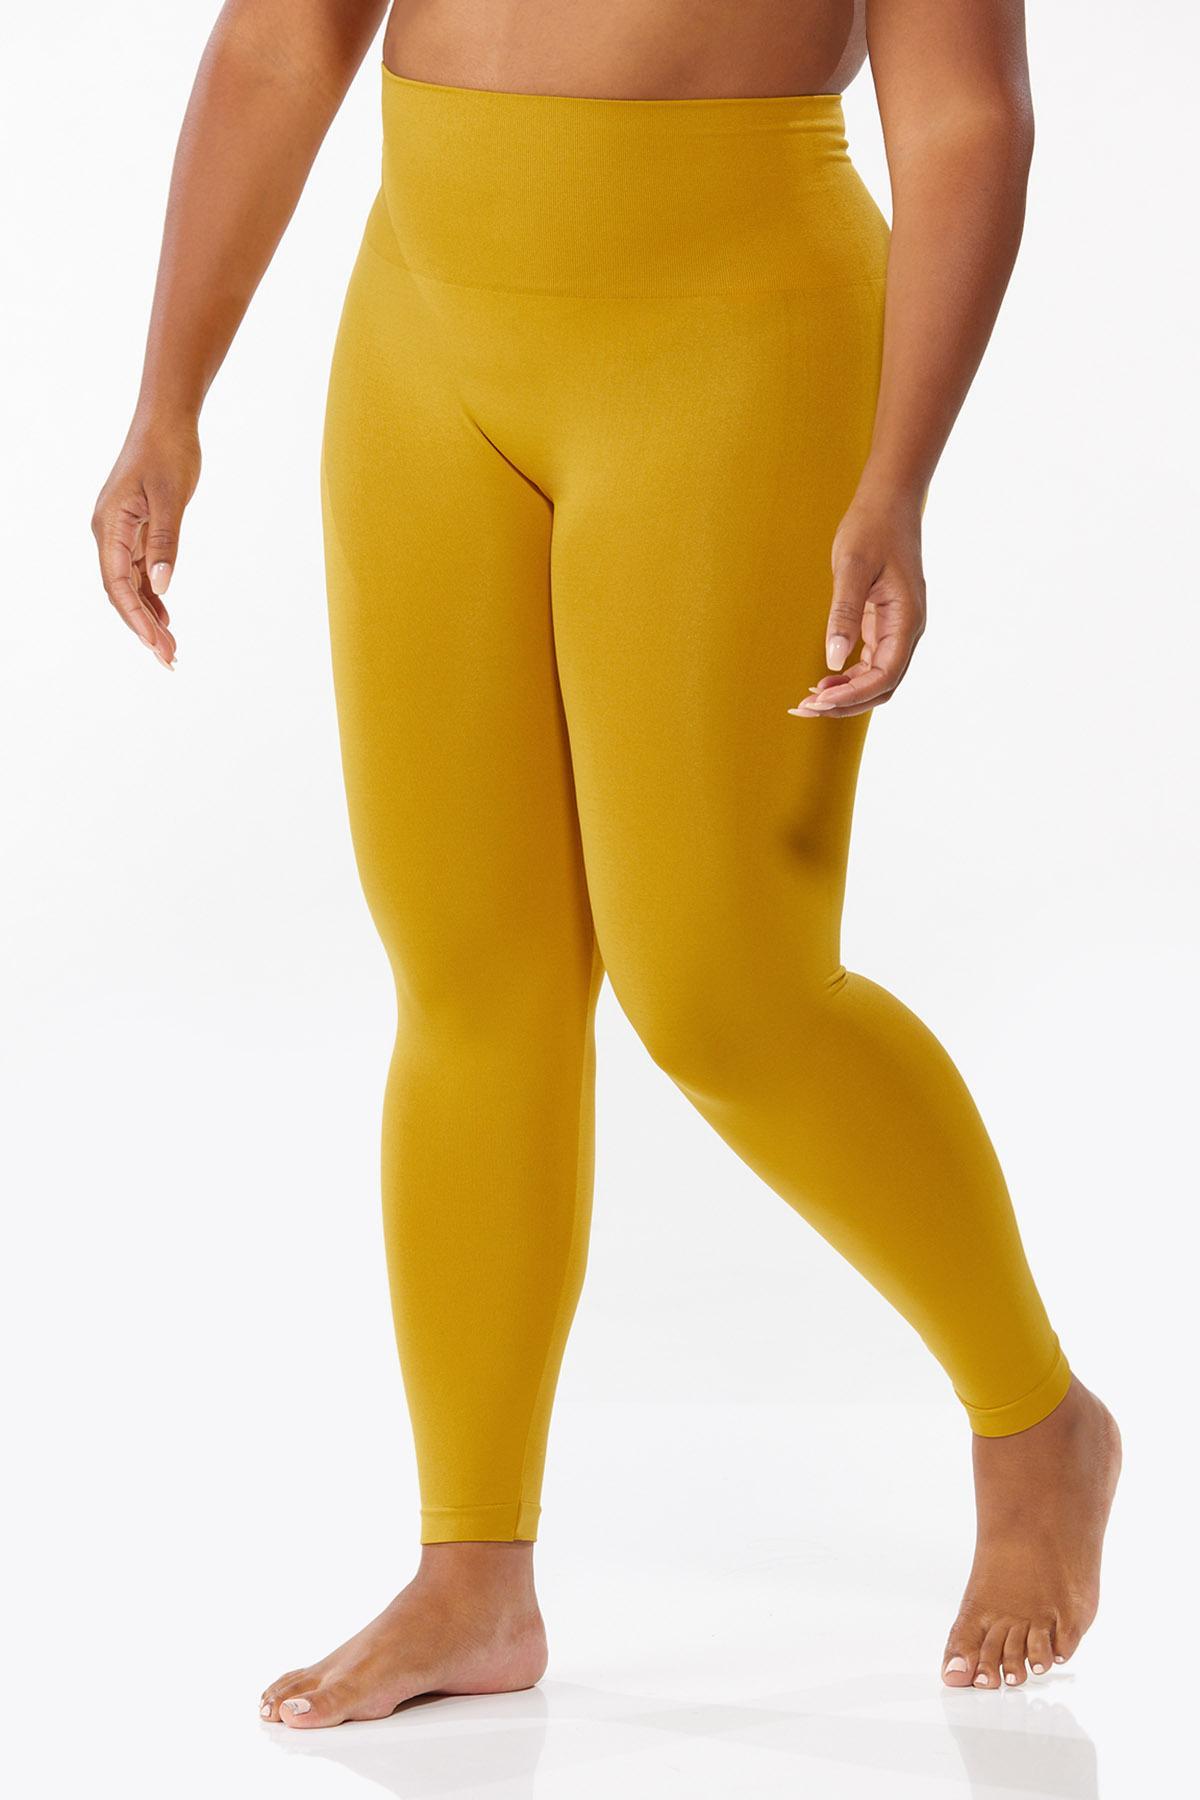 Plus Size The Perfect Golden Leggings